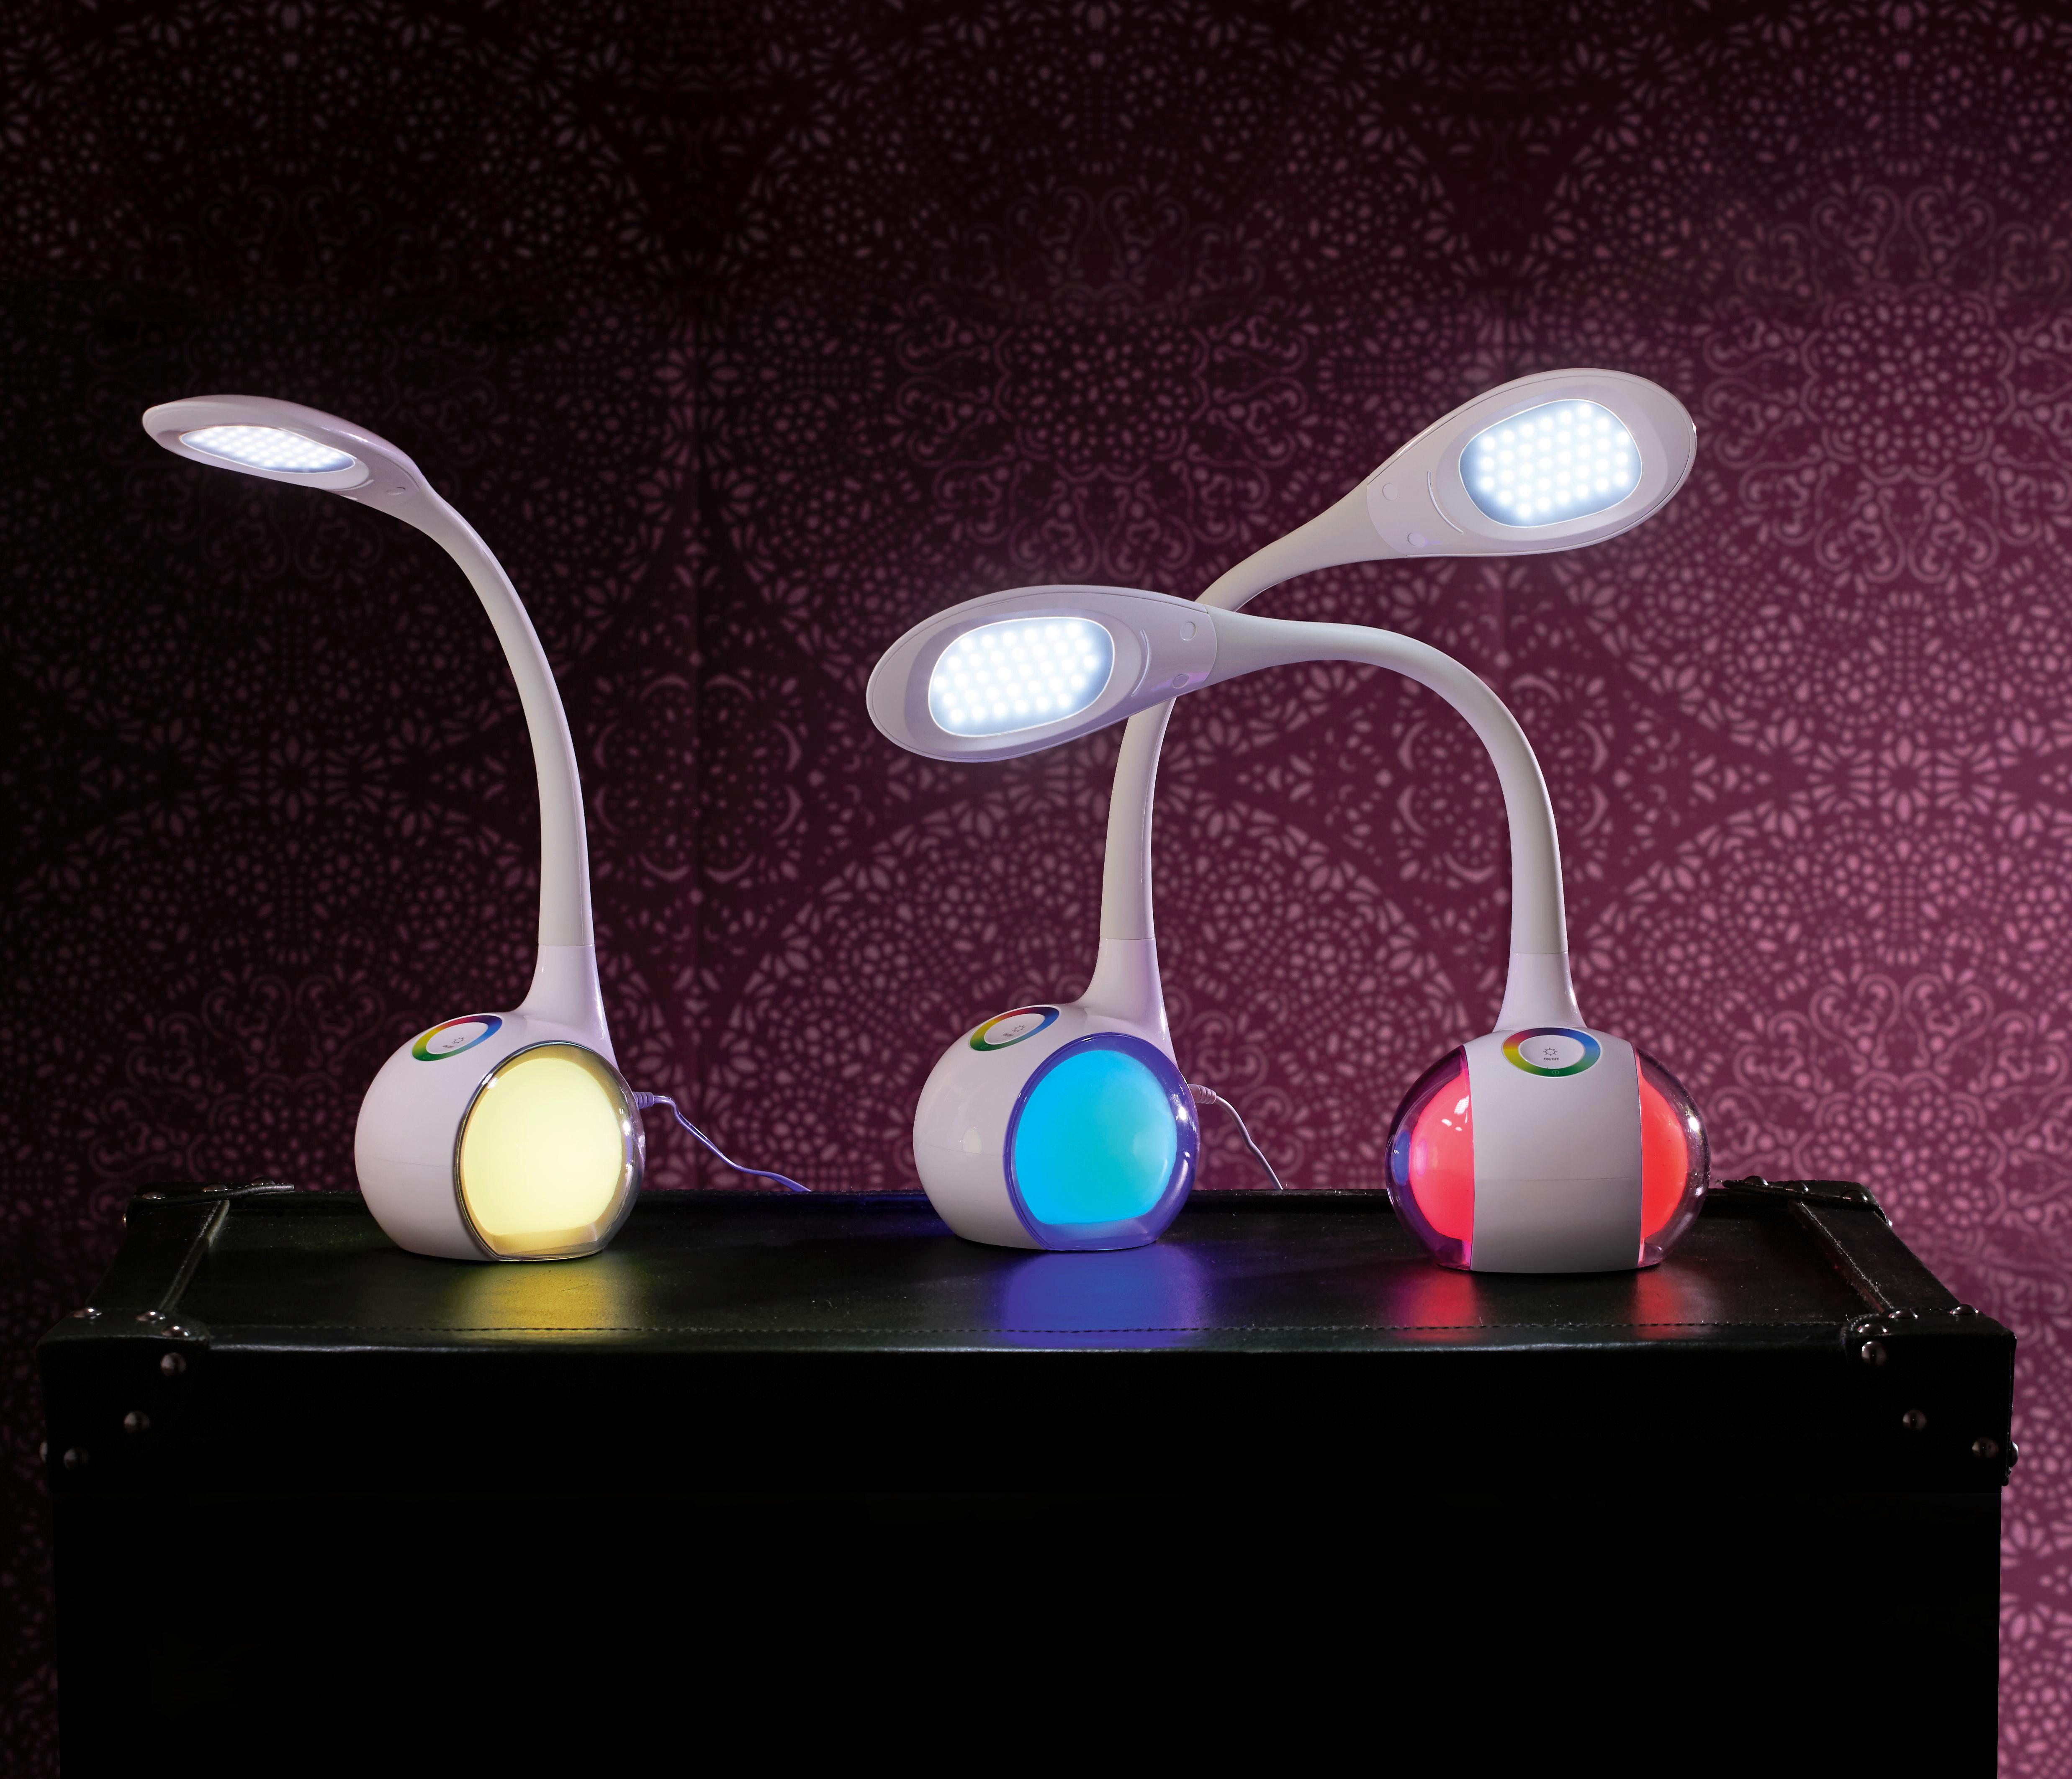 LED-SKRIVBORDSLAMPA - vit, Trend, metall/plast (13,5/11,5/52,5cm) - Boxxx